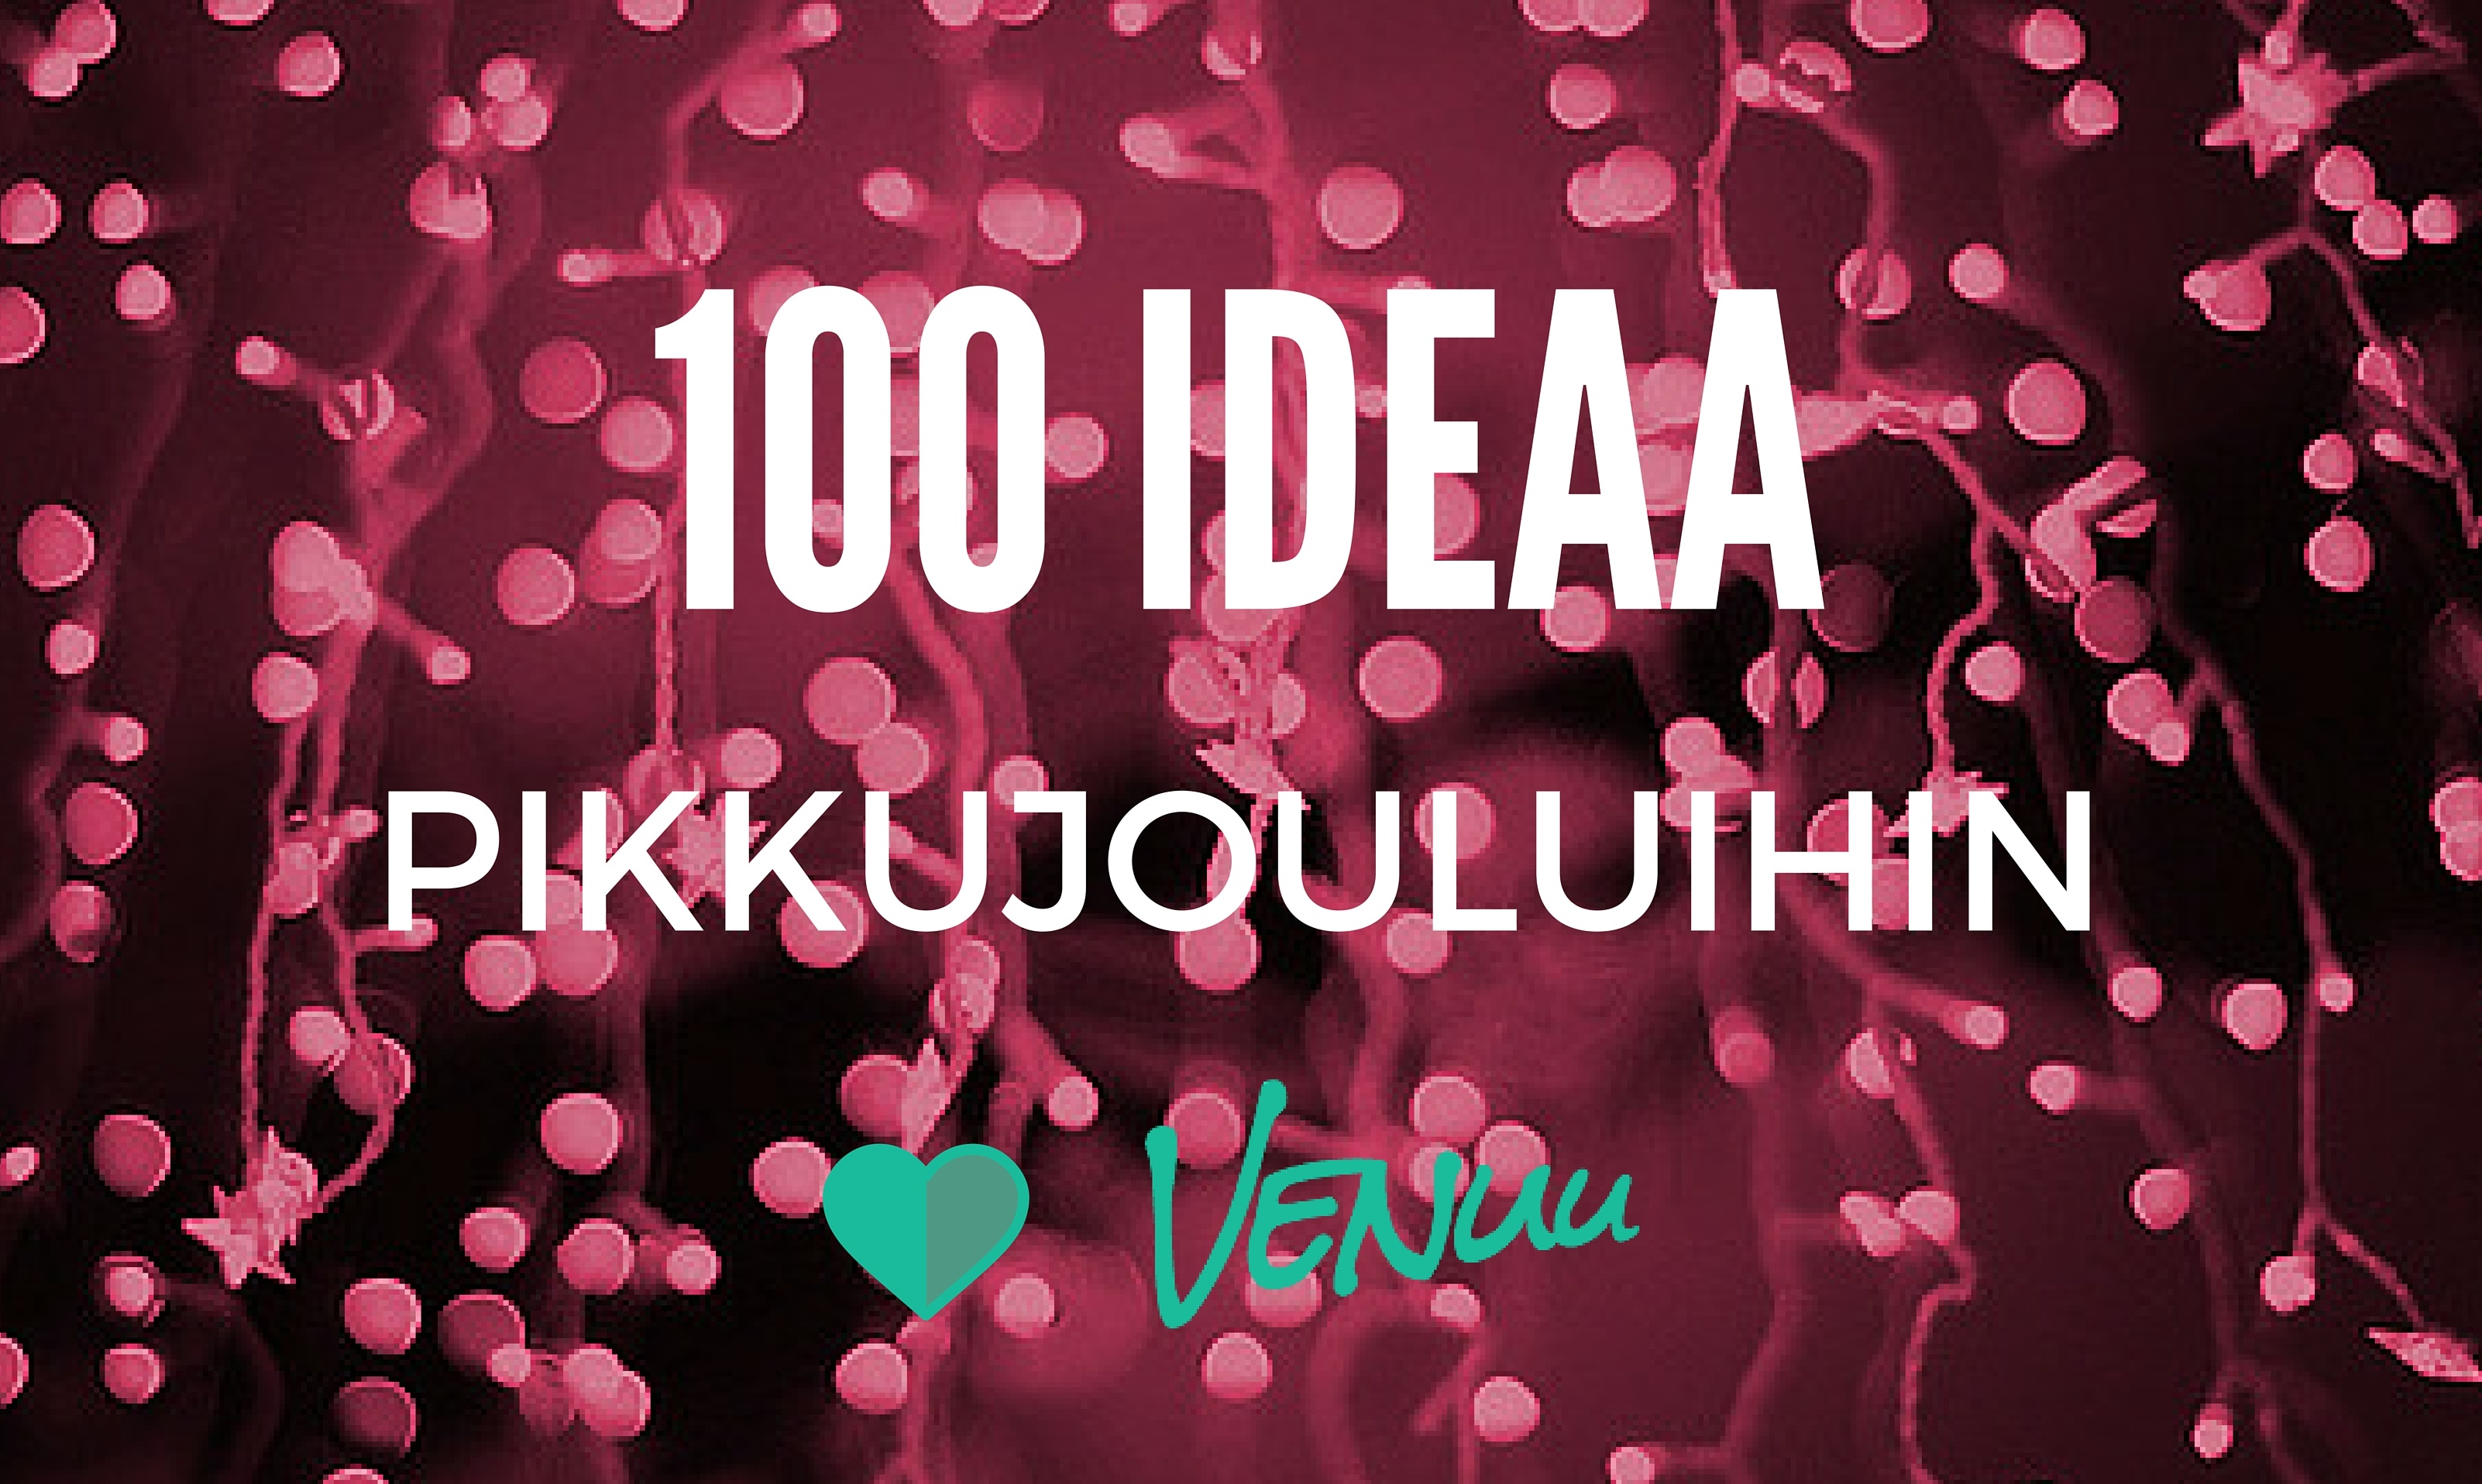 100<em>ideaa</em>pikkujouluihin.jpg